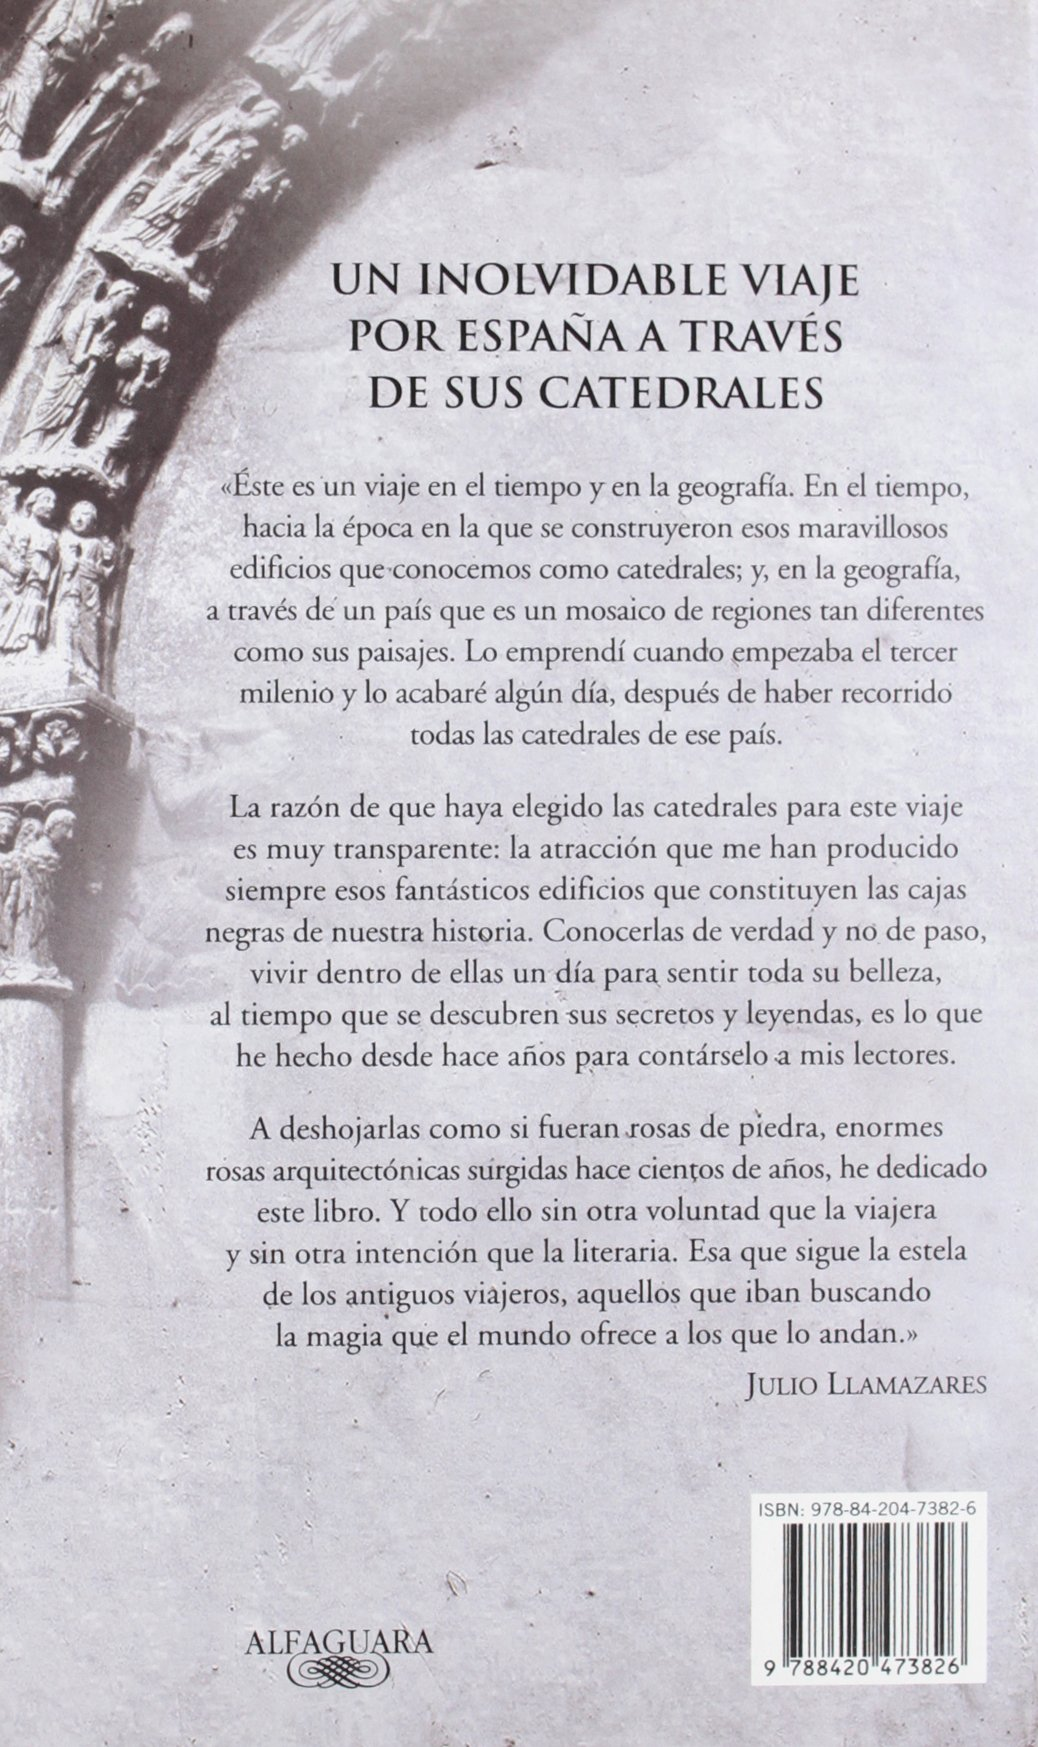 Las rosas de piedra (Spanish Edition): Julio Llamazares: 9788420473826: Amazon.com: Books